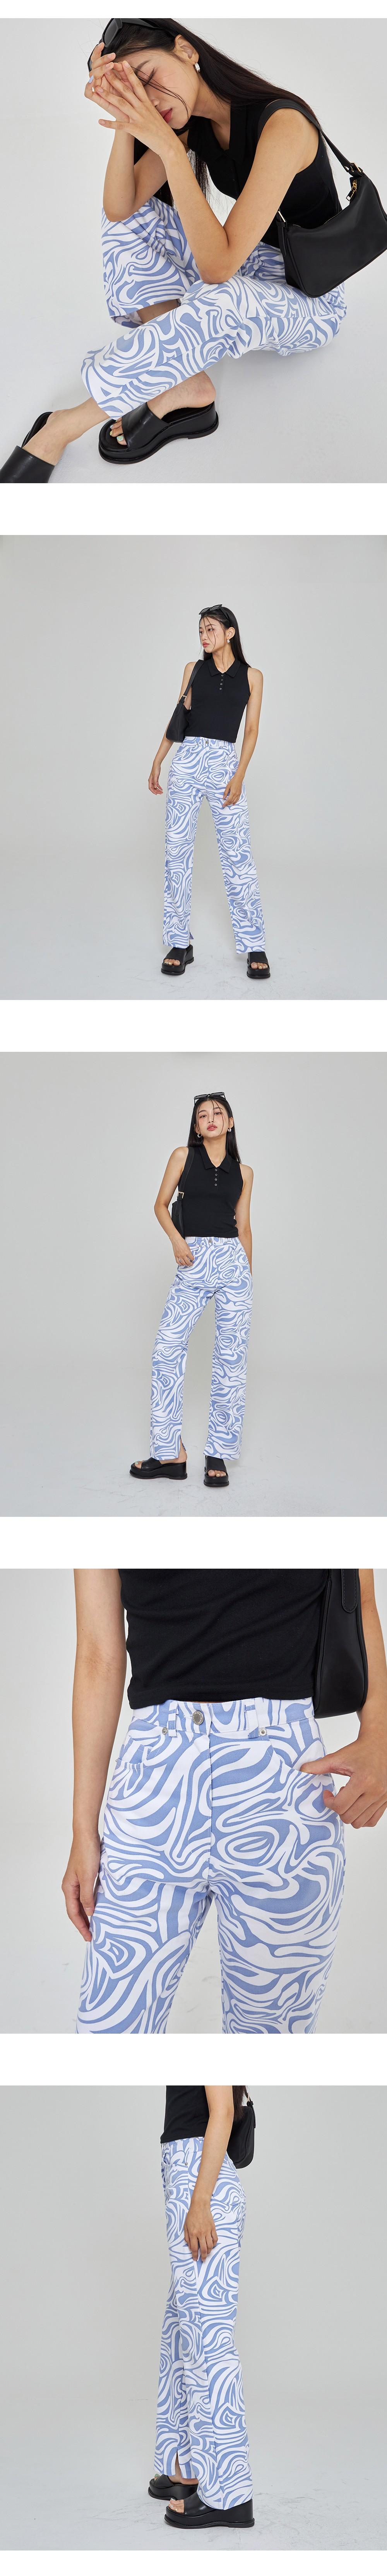 wavy cotton trousers